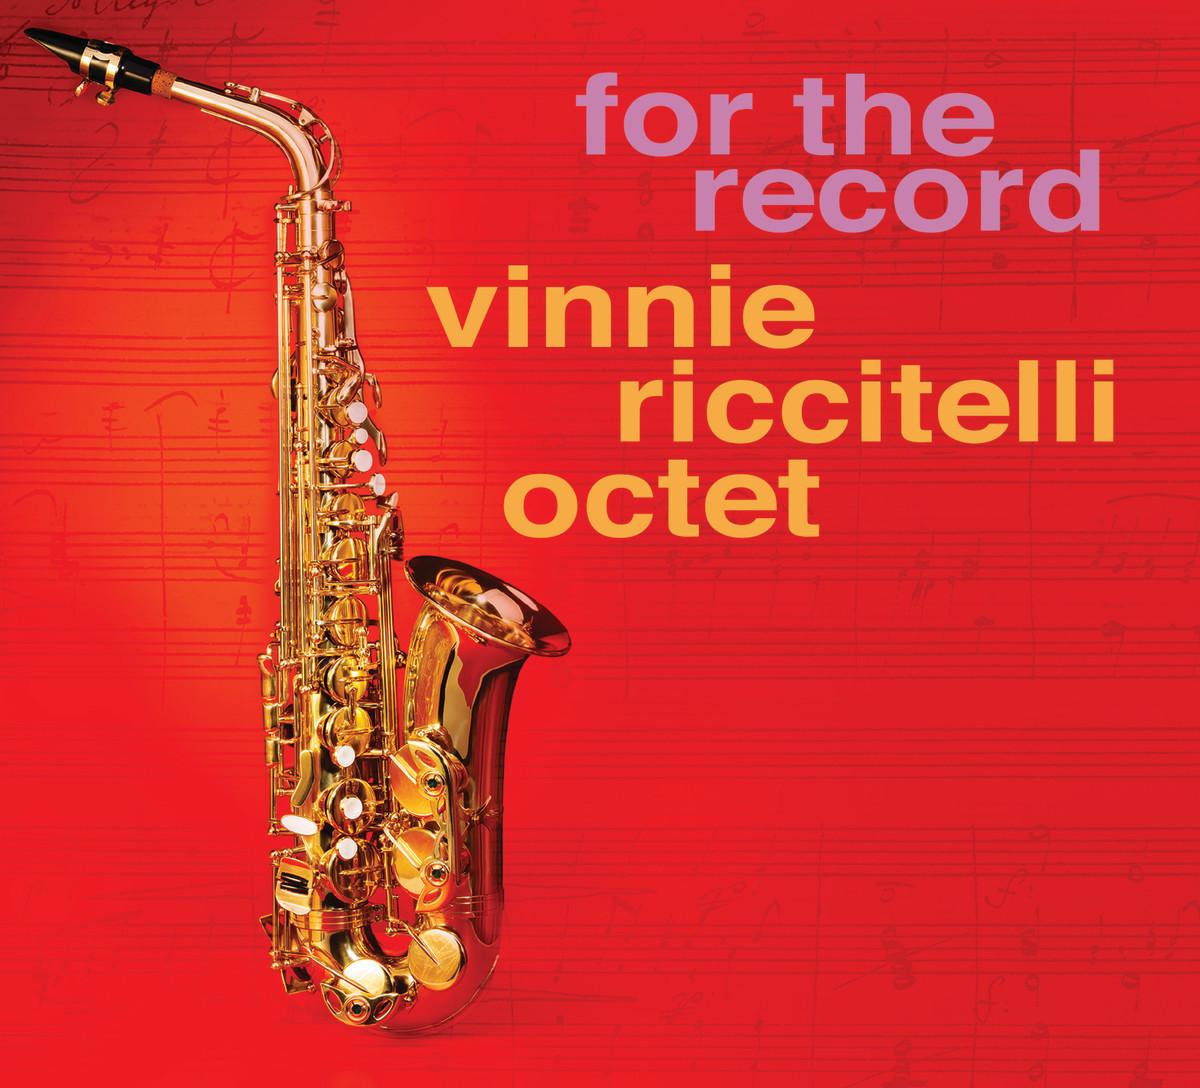 Vinnie Riccitelli Octet